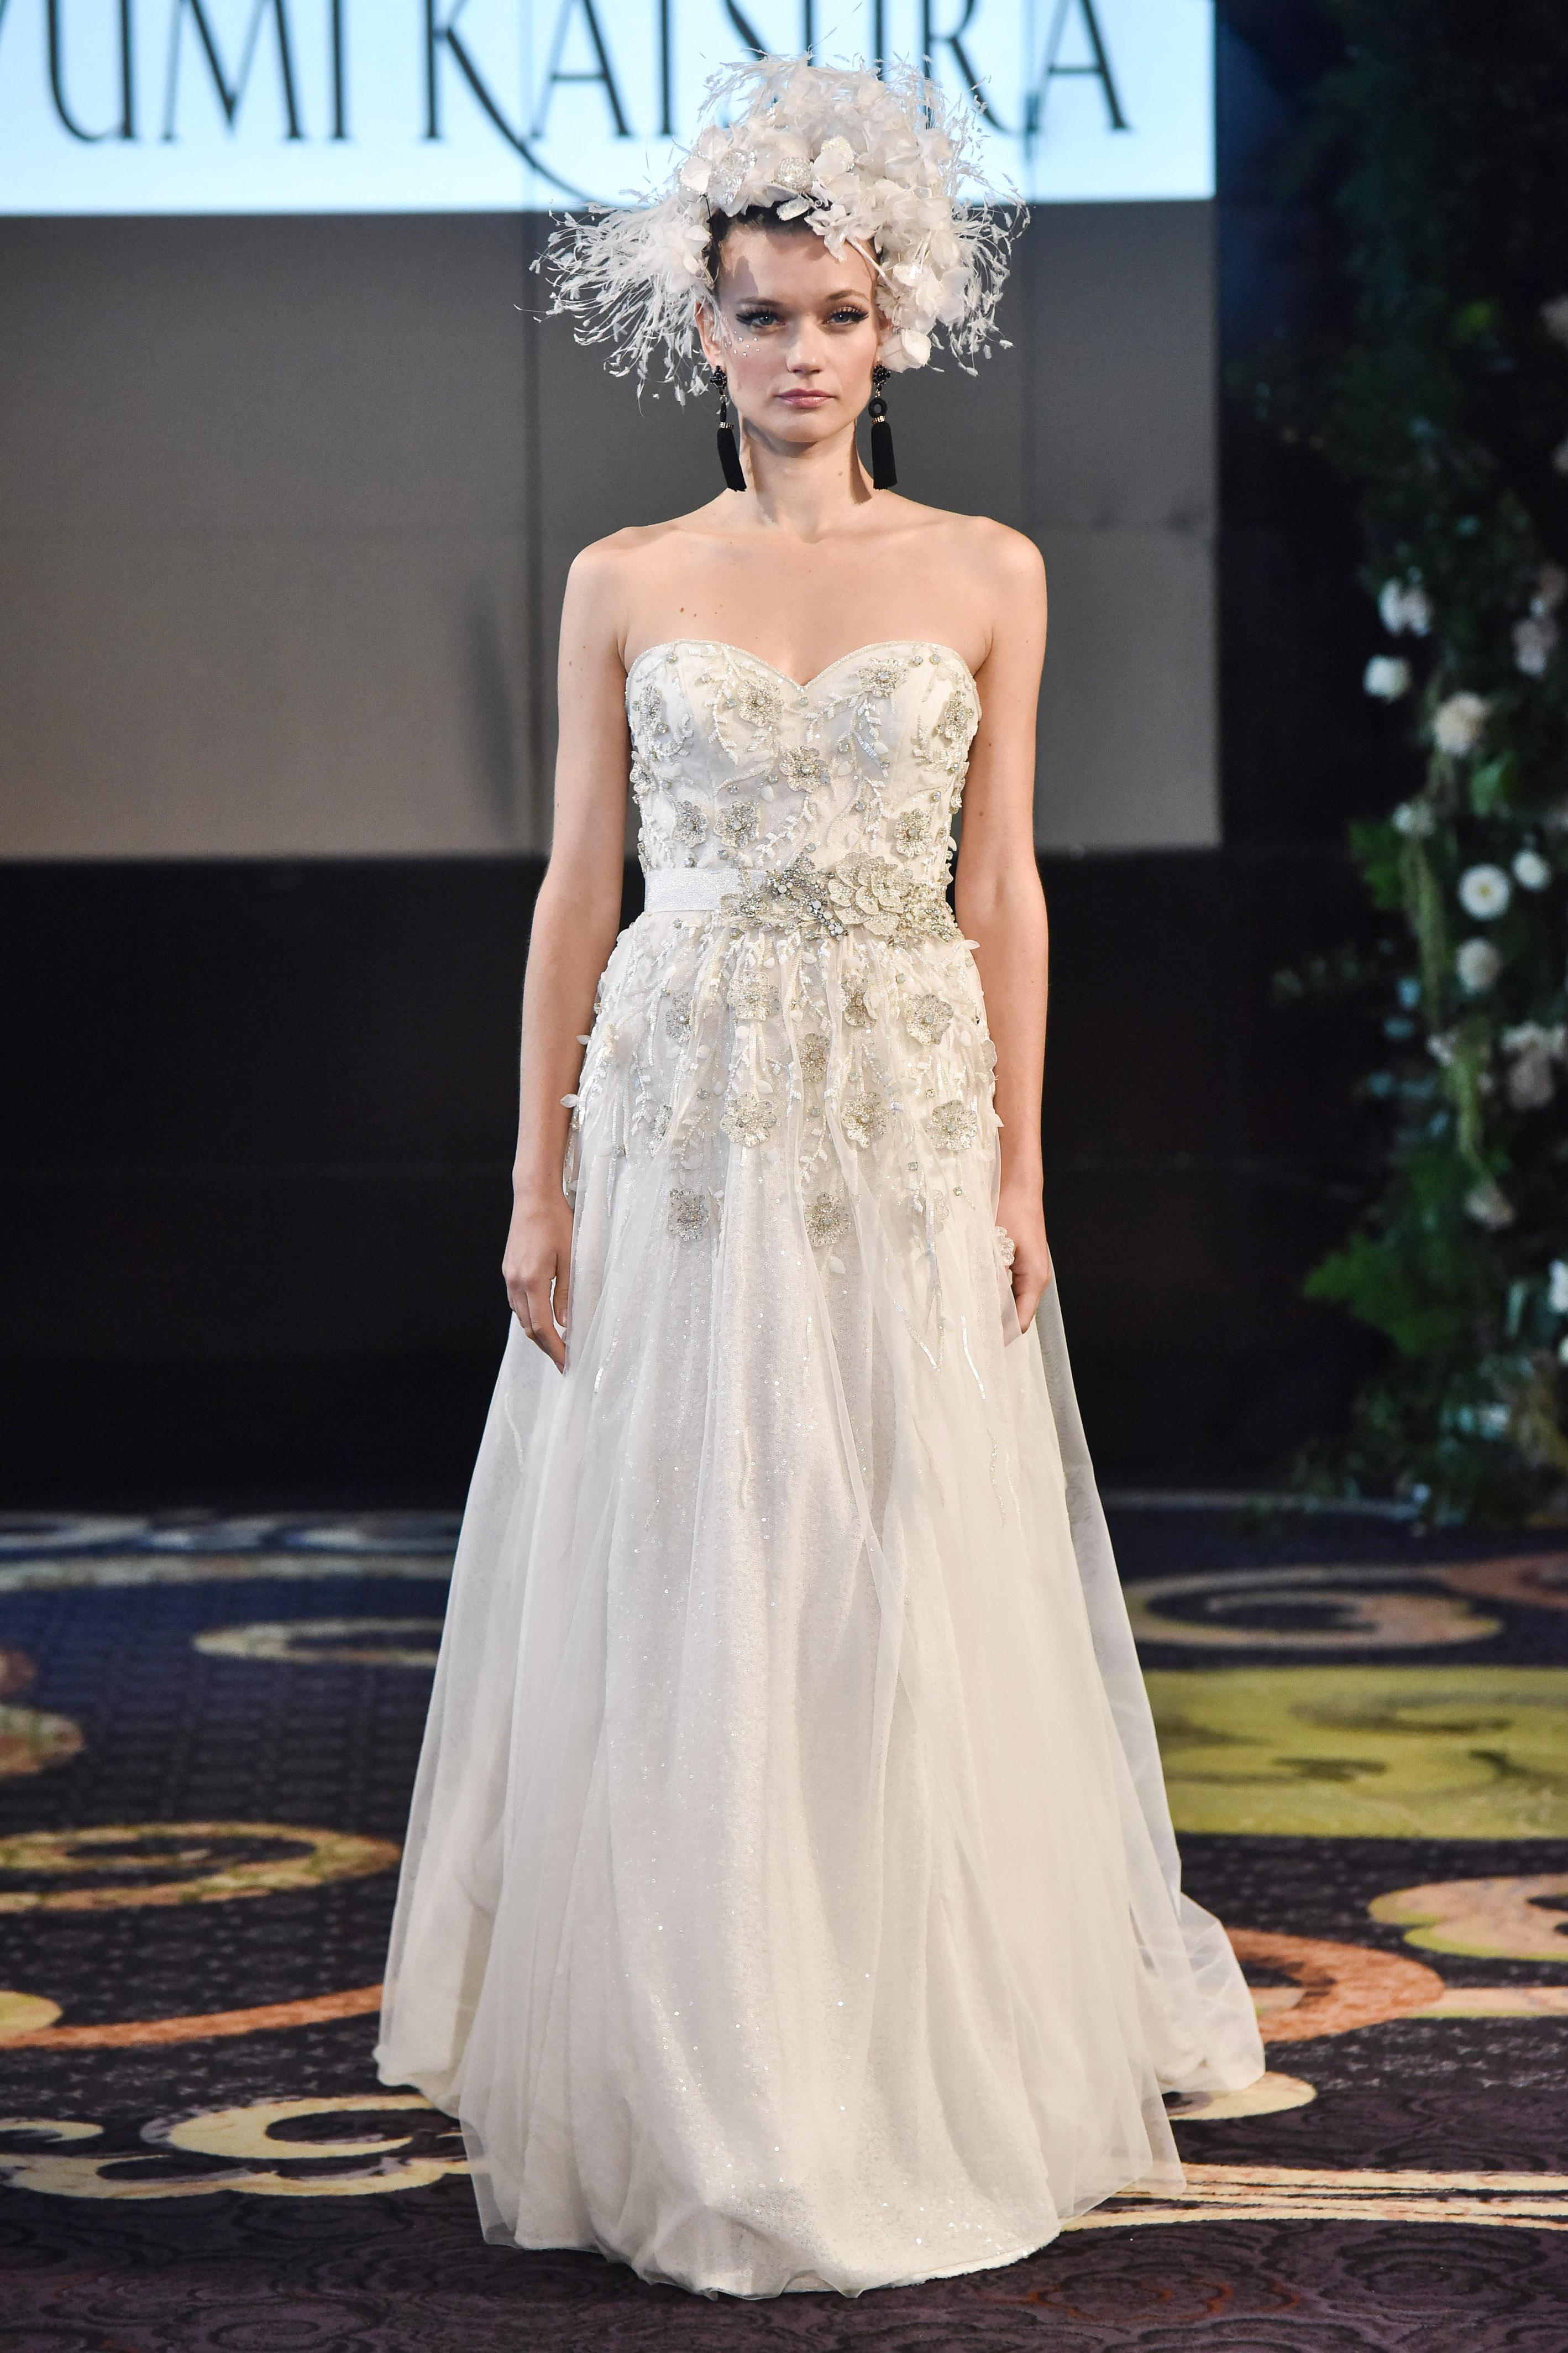 yumi katsura sheath sweetheart neckline wedding dress with feather applique fall 2018